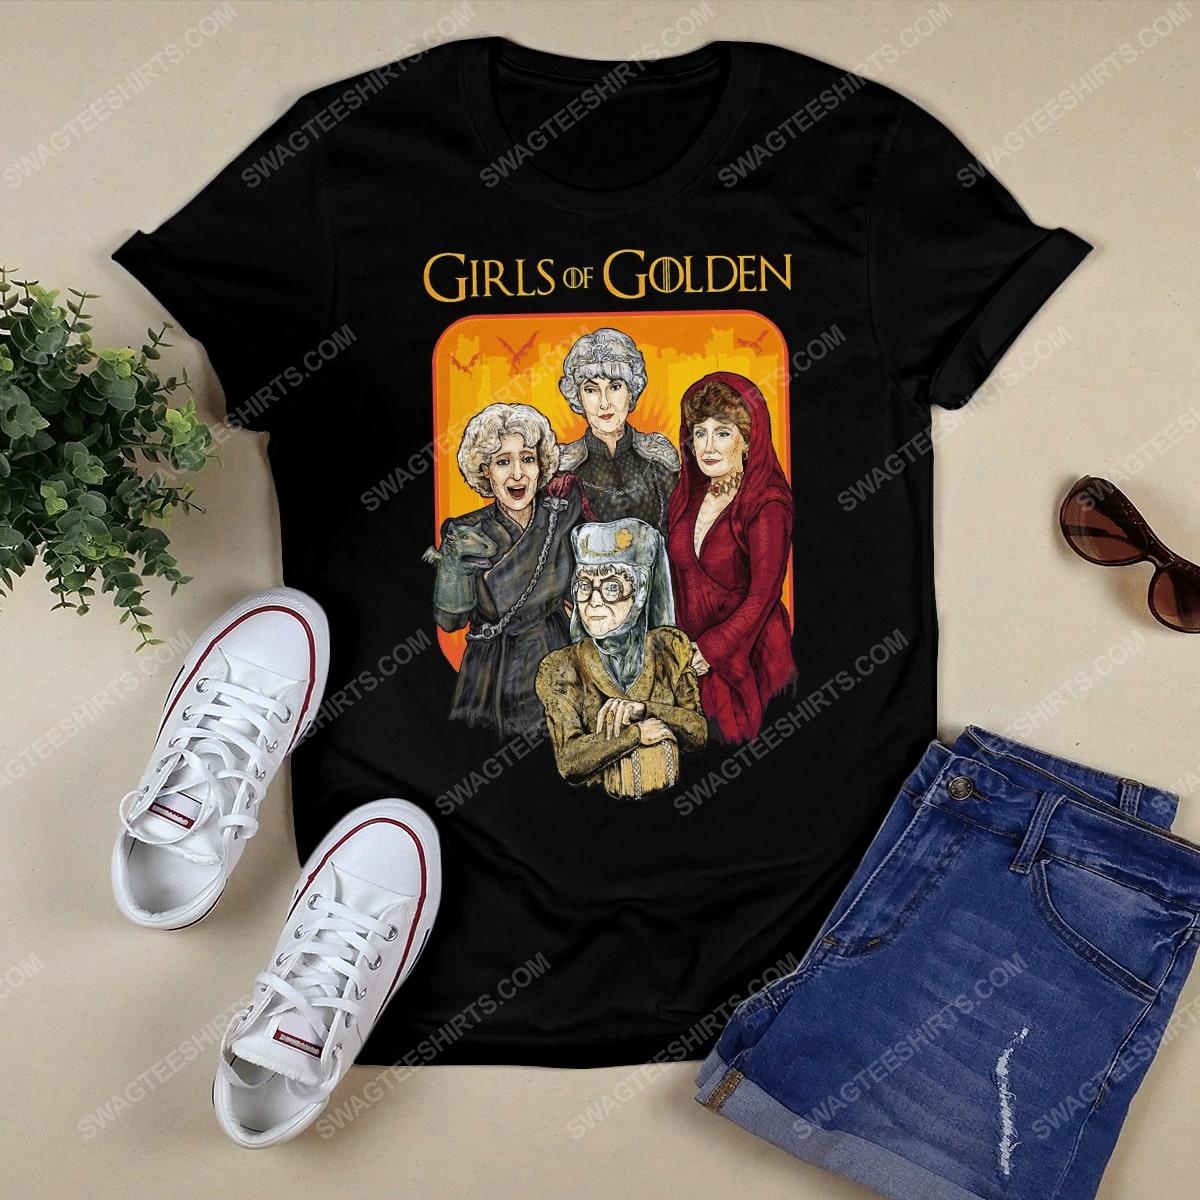 Game of thrones and the golden girls girls of golden tshirt 1